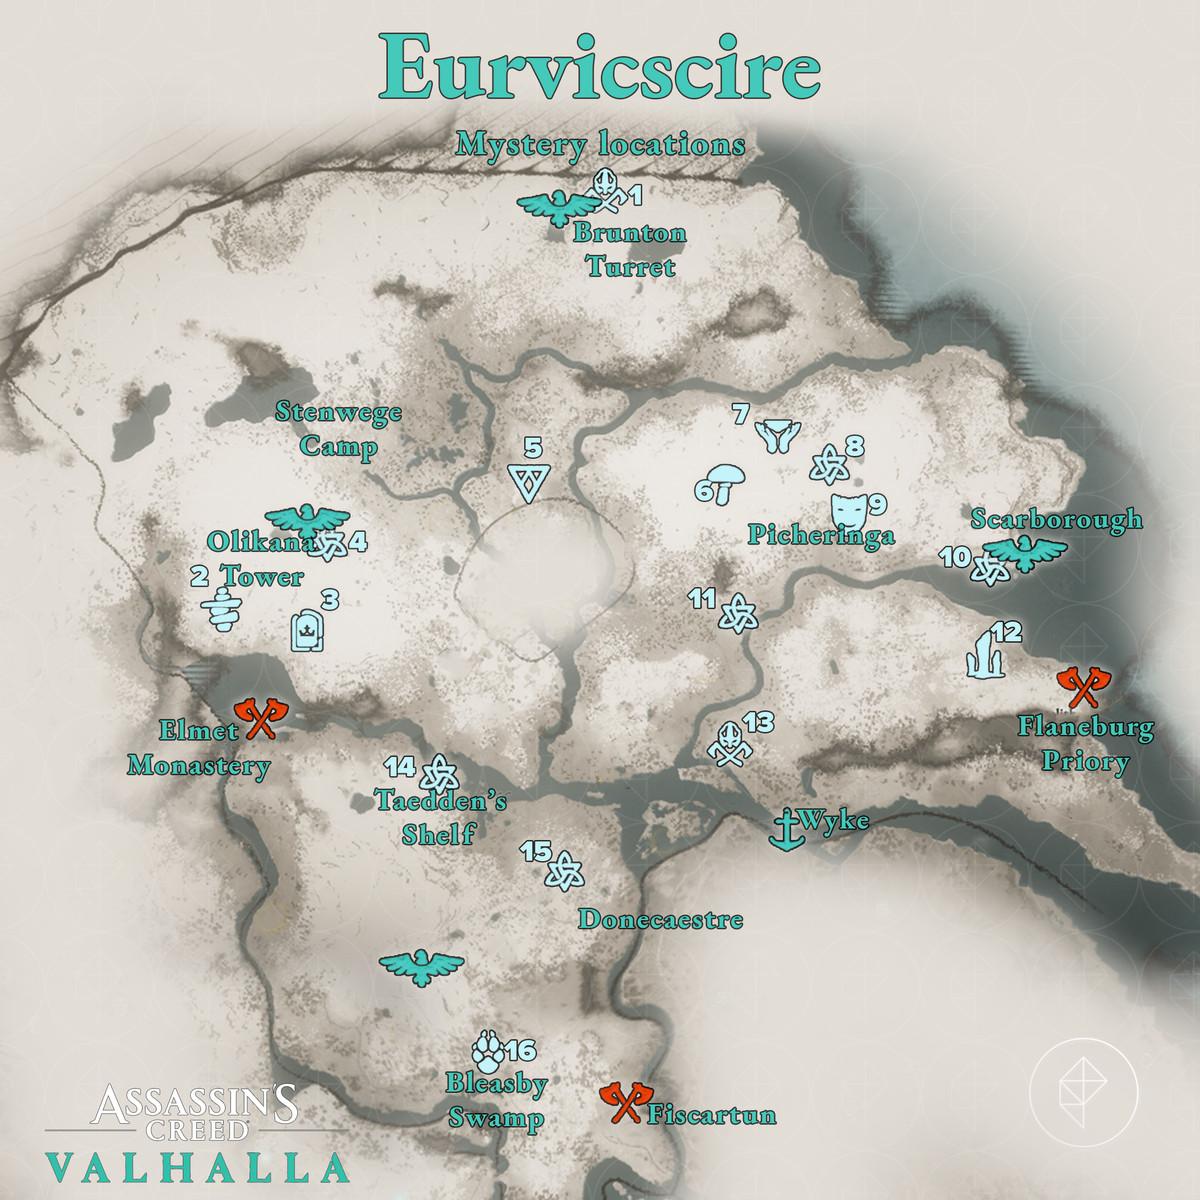 Euriviscire Mysteries locations map